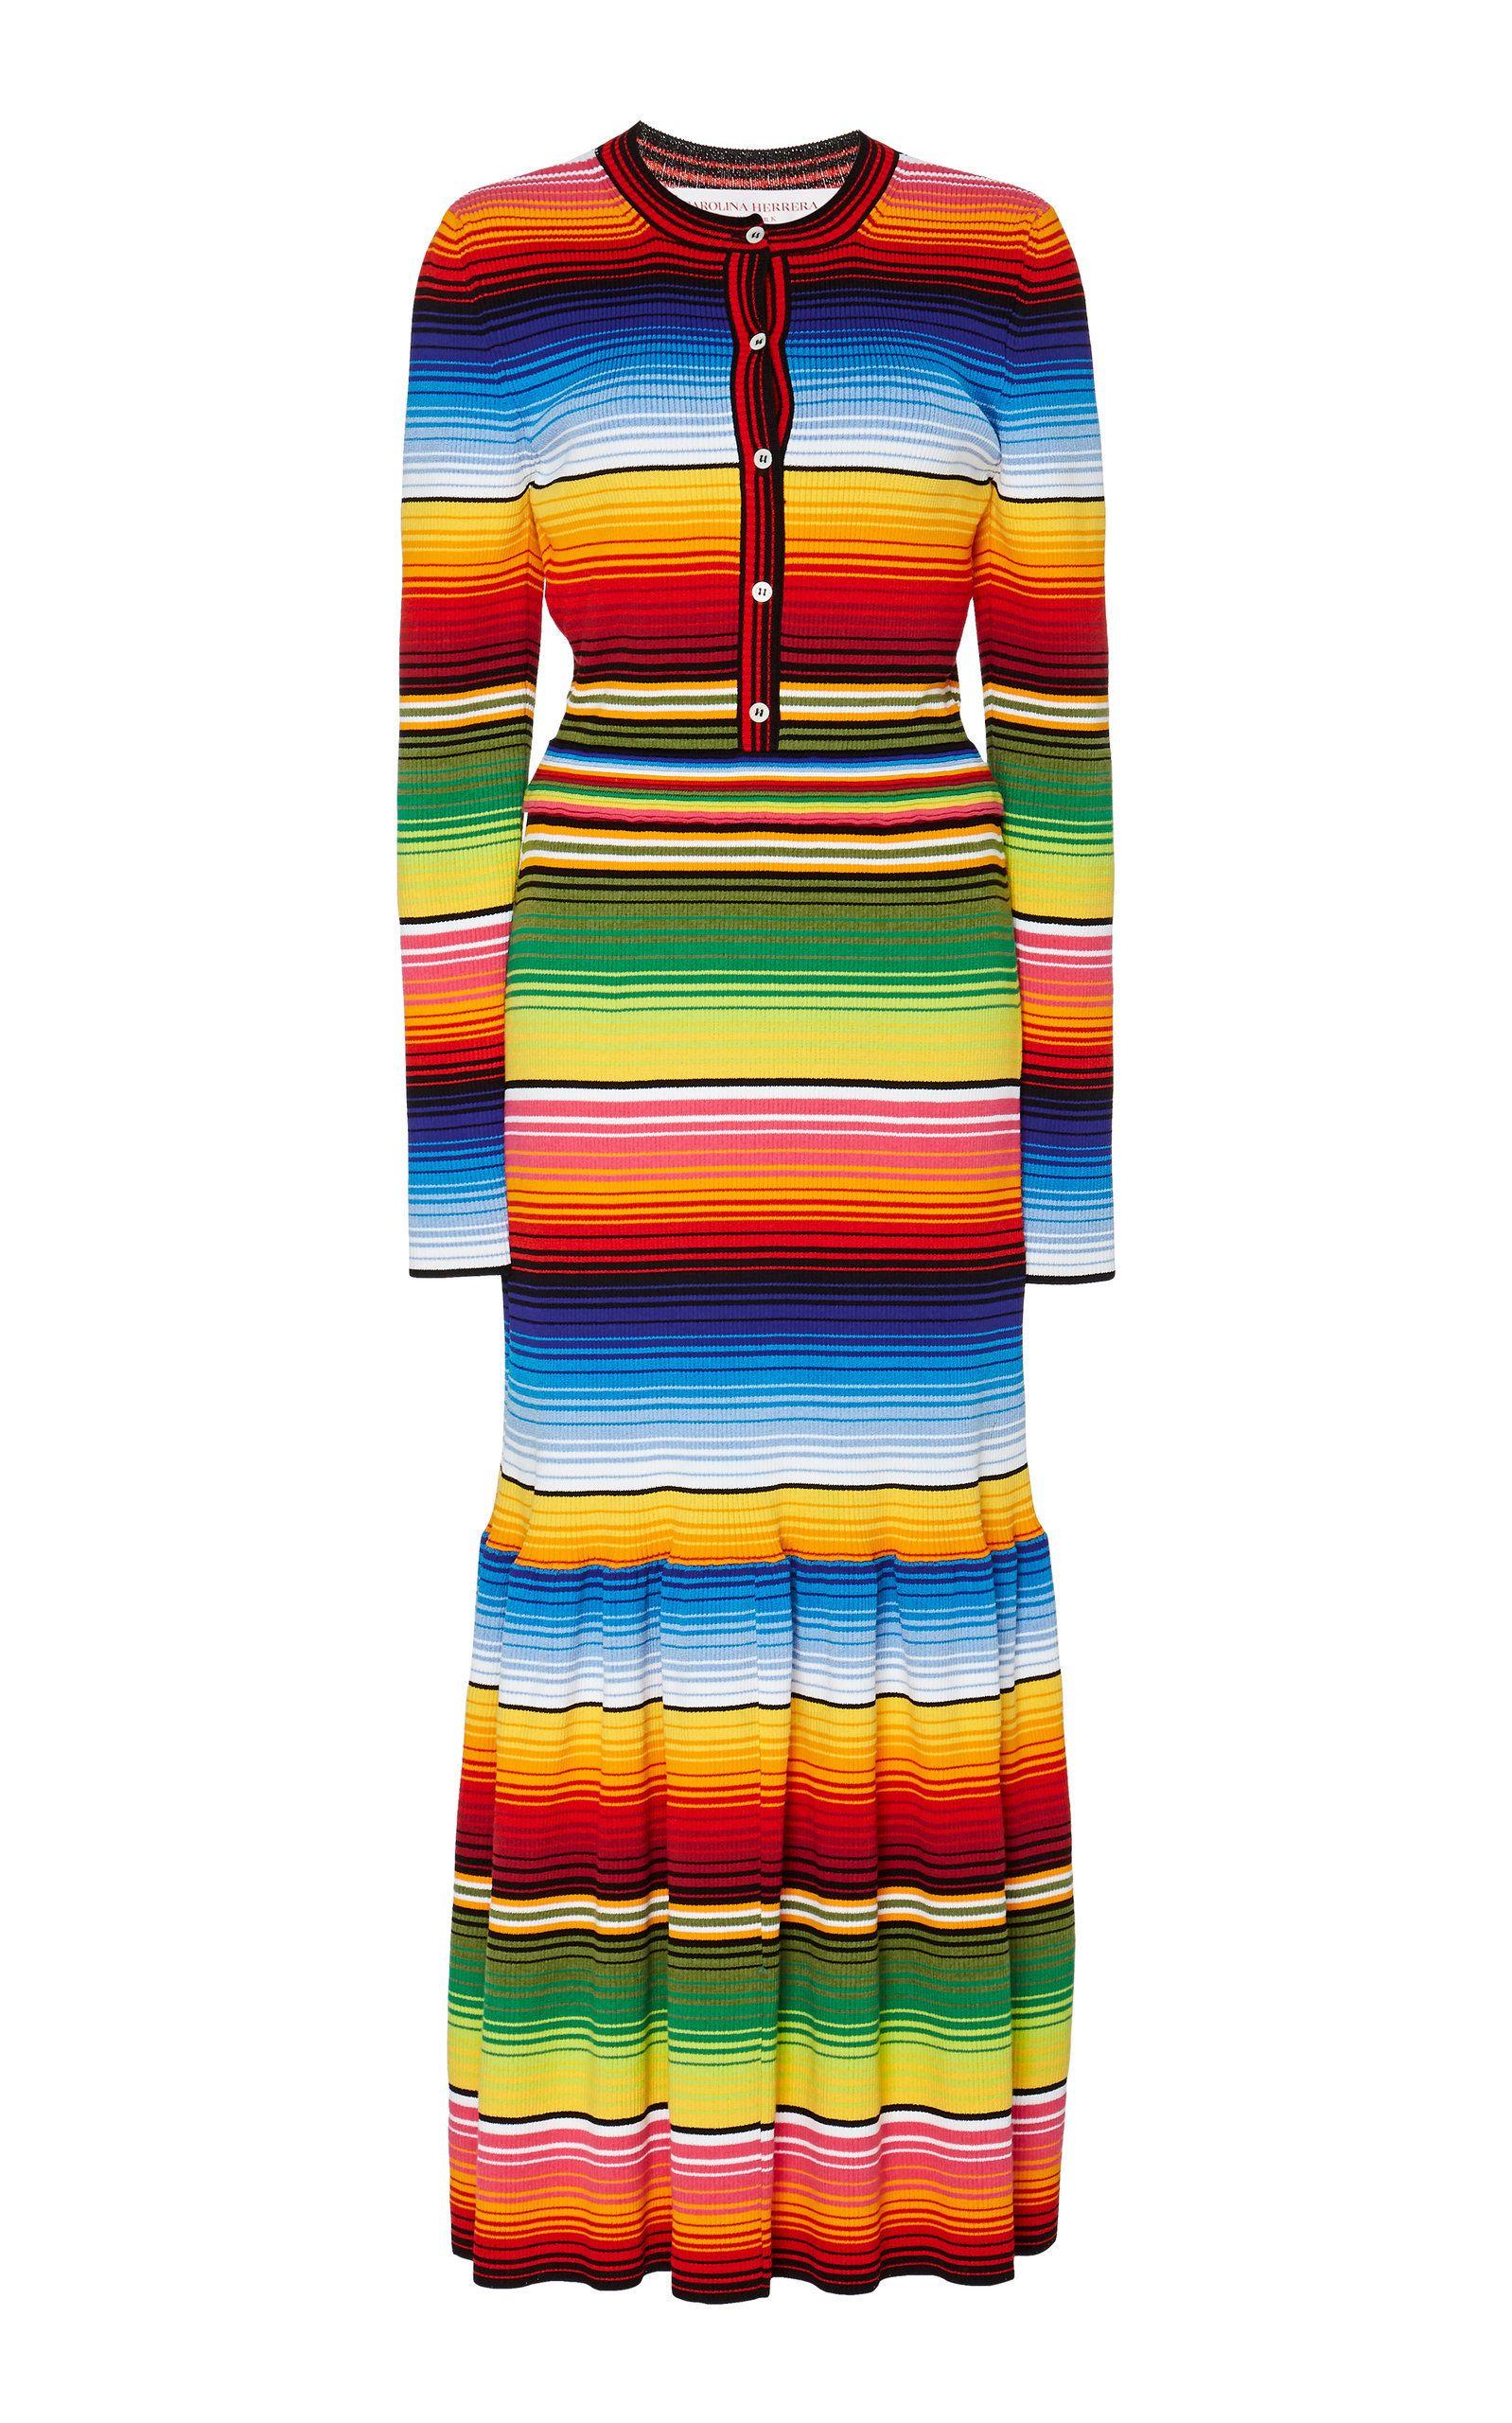 Cotton Blend Striped Knit Dress By Carolina Herrera For Preorder On Moda Operandi Carolina Herrera Striped Knit Dress Sweater Dress [ 2560 x 1598 Pixel ]